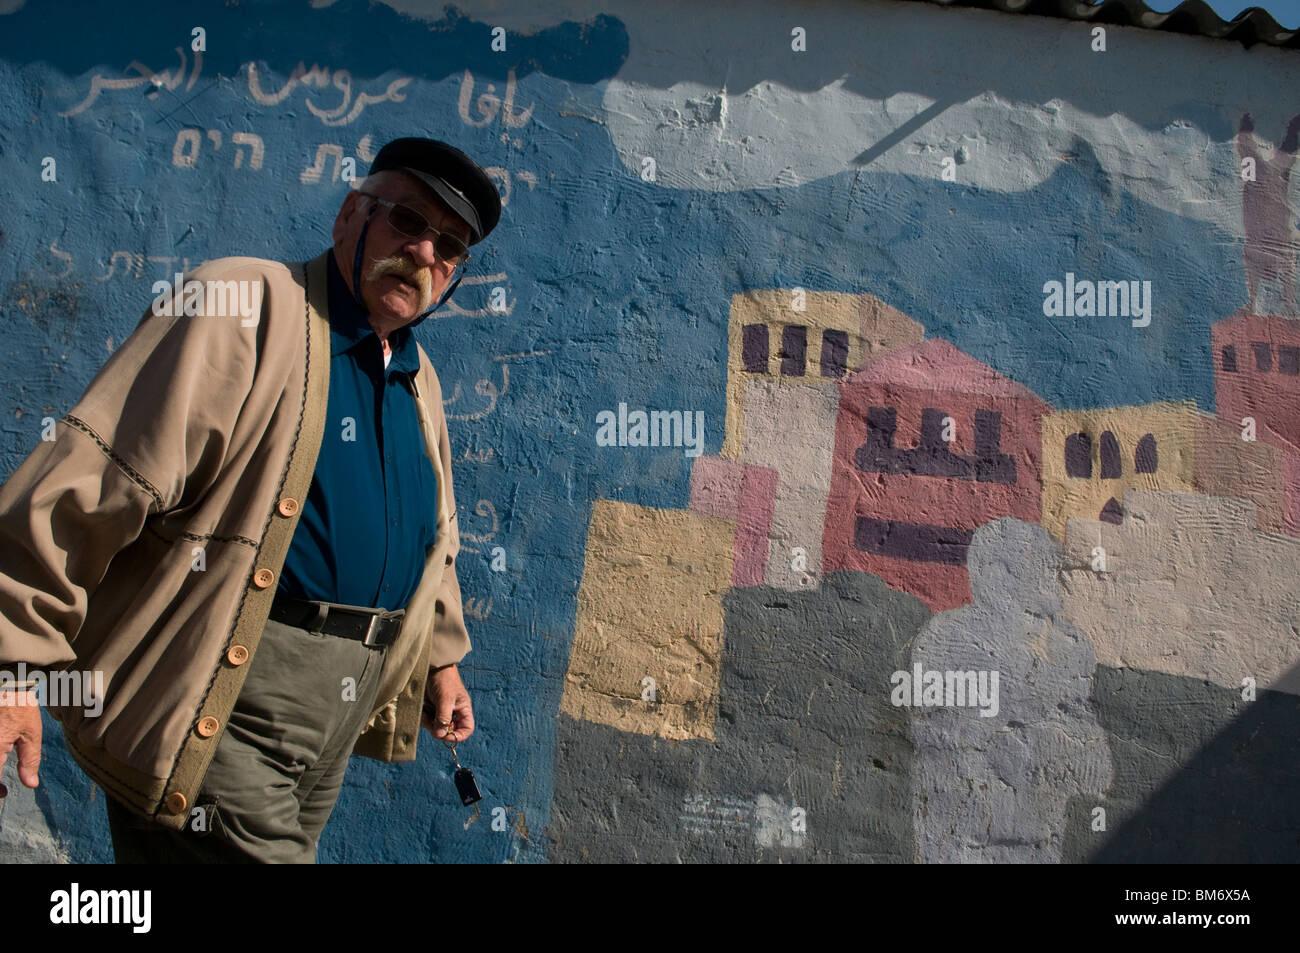 A pedestrian pass graffiti wall in Ajami a mixed Arab Jewish neighborhood south of Tel Aviv Israel - Stock Image